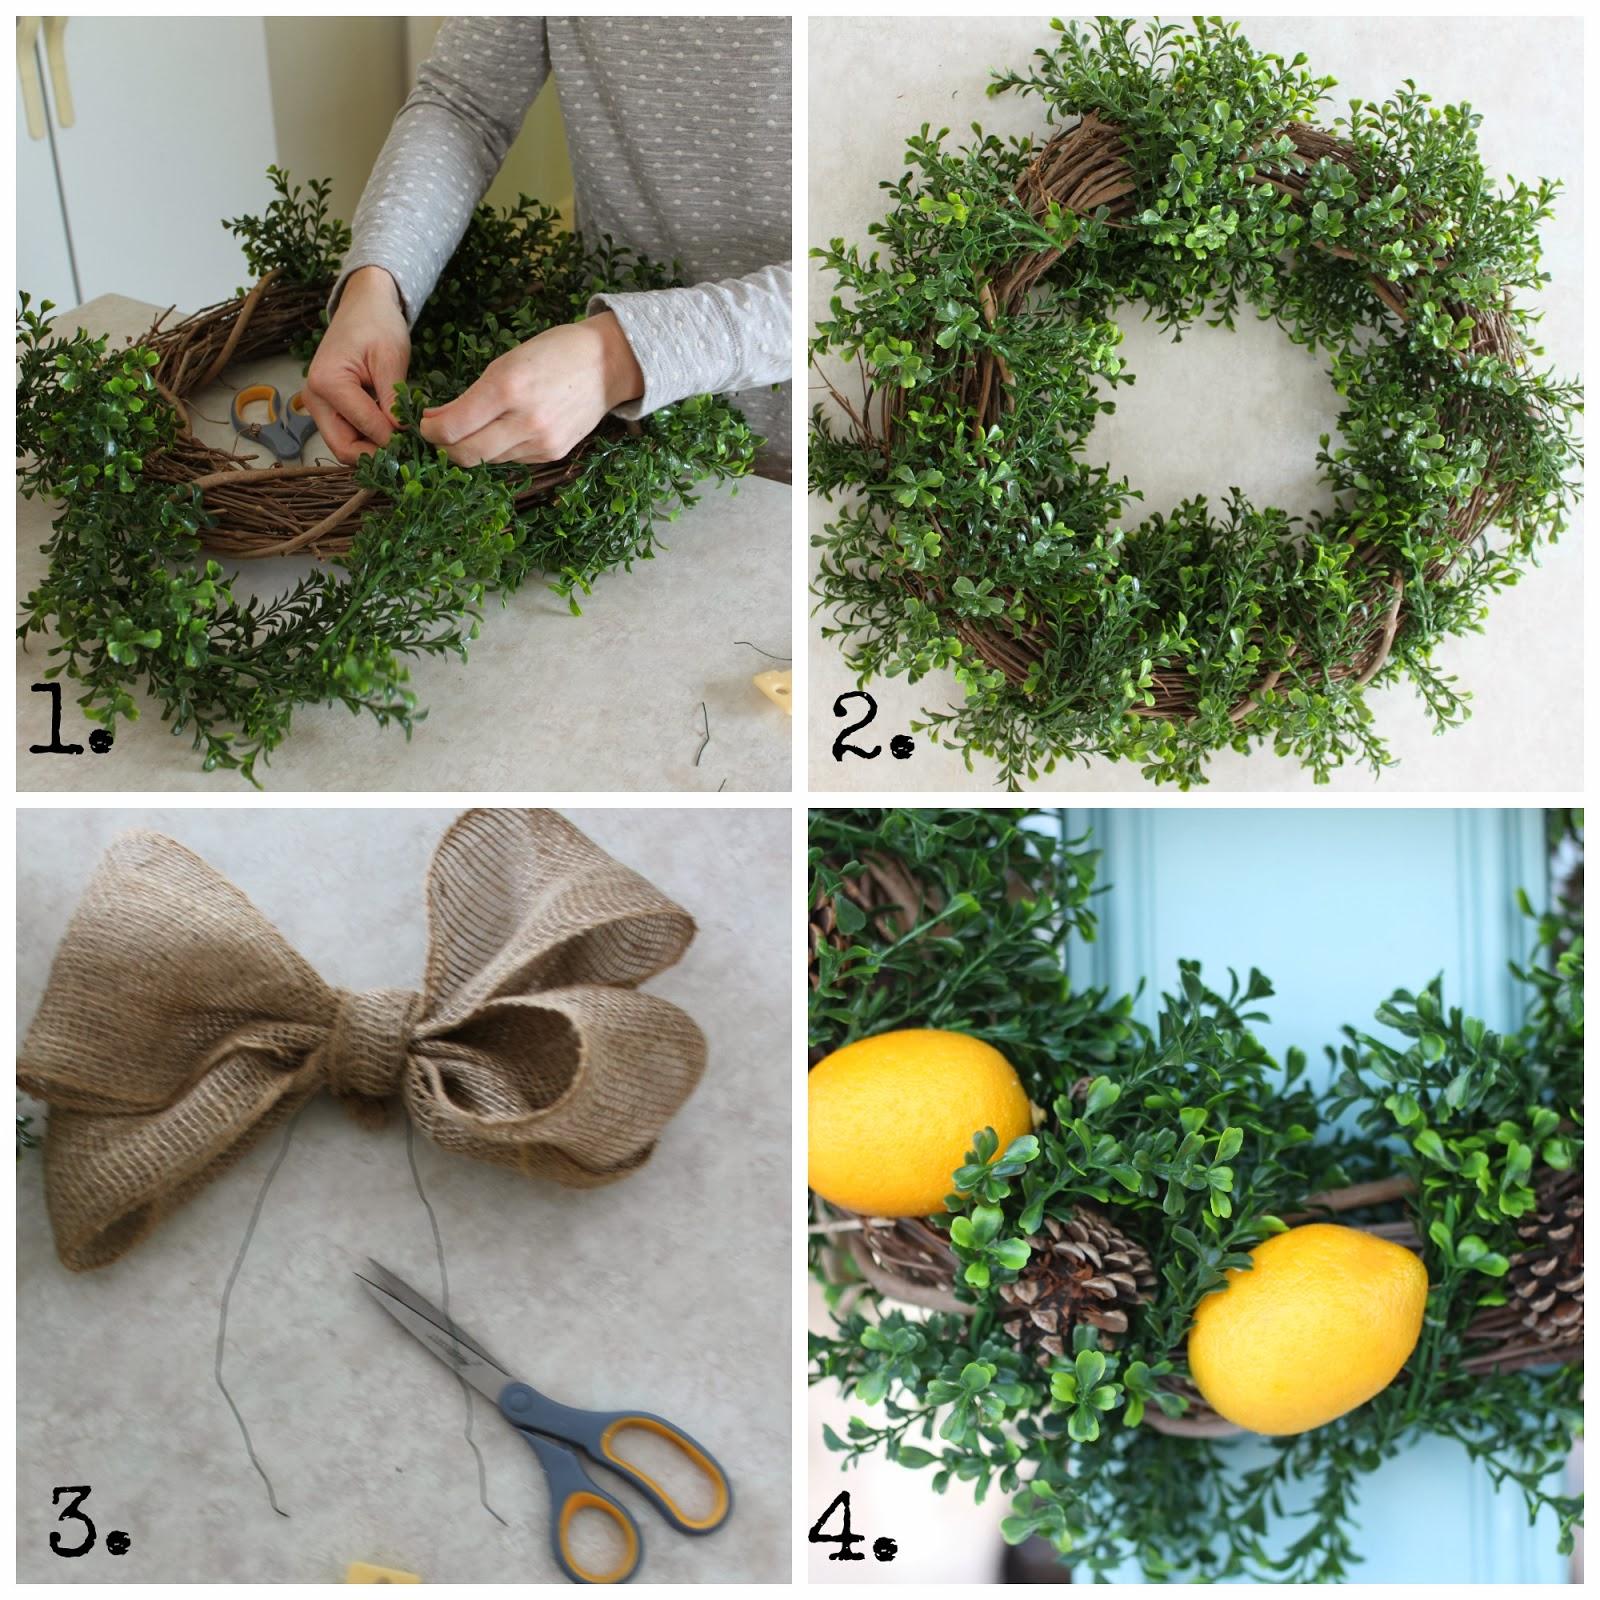 A twine wreath, greenery, scissors, a bow and lemons on the wreath.